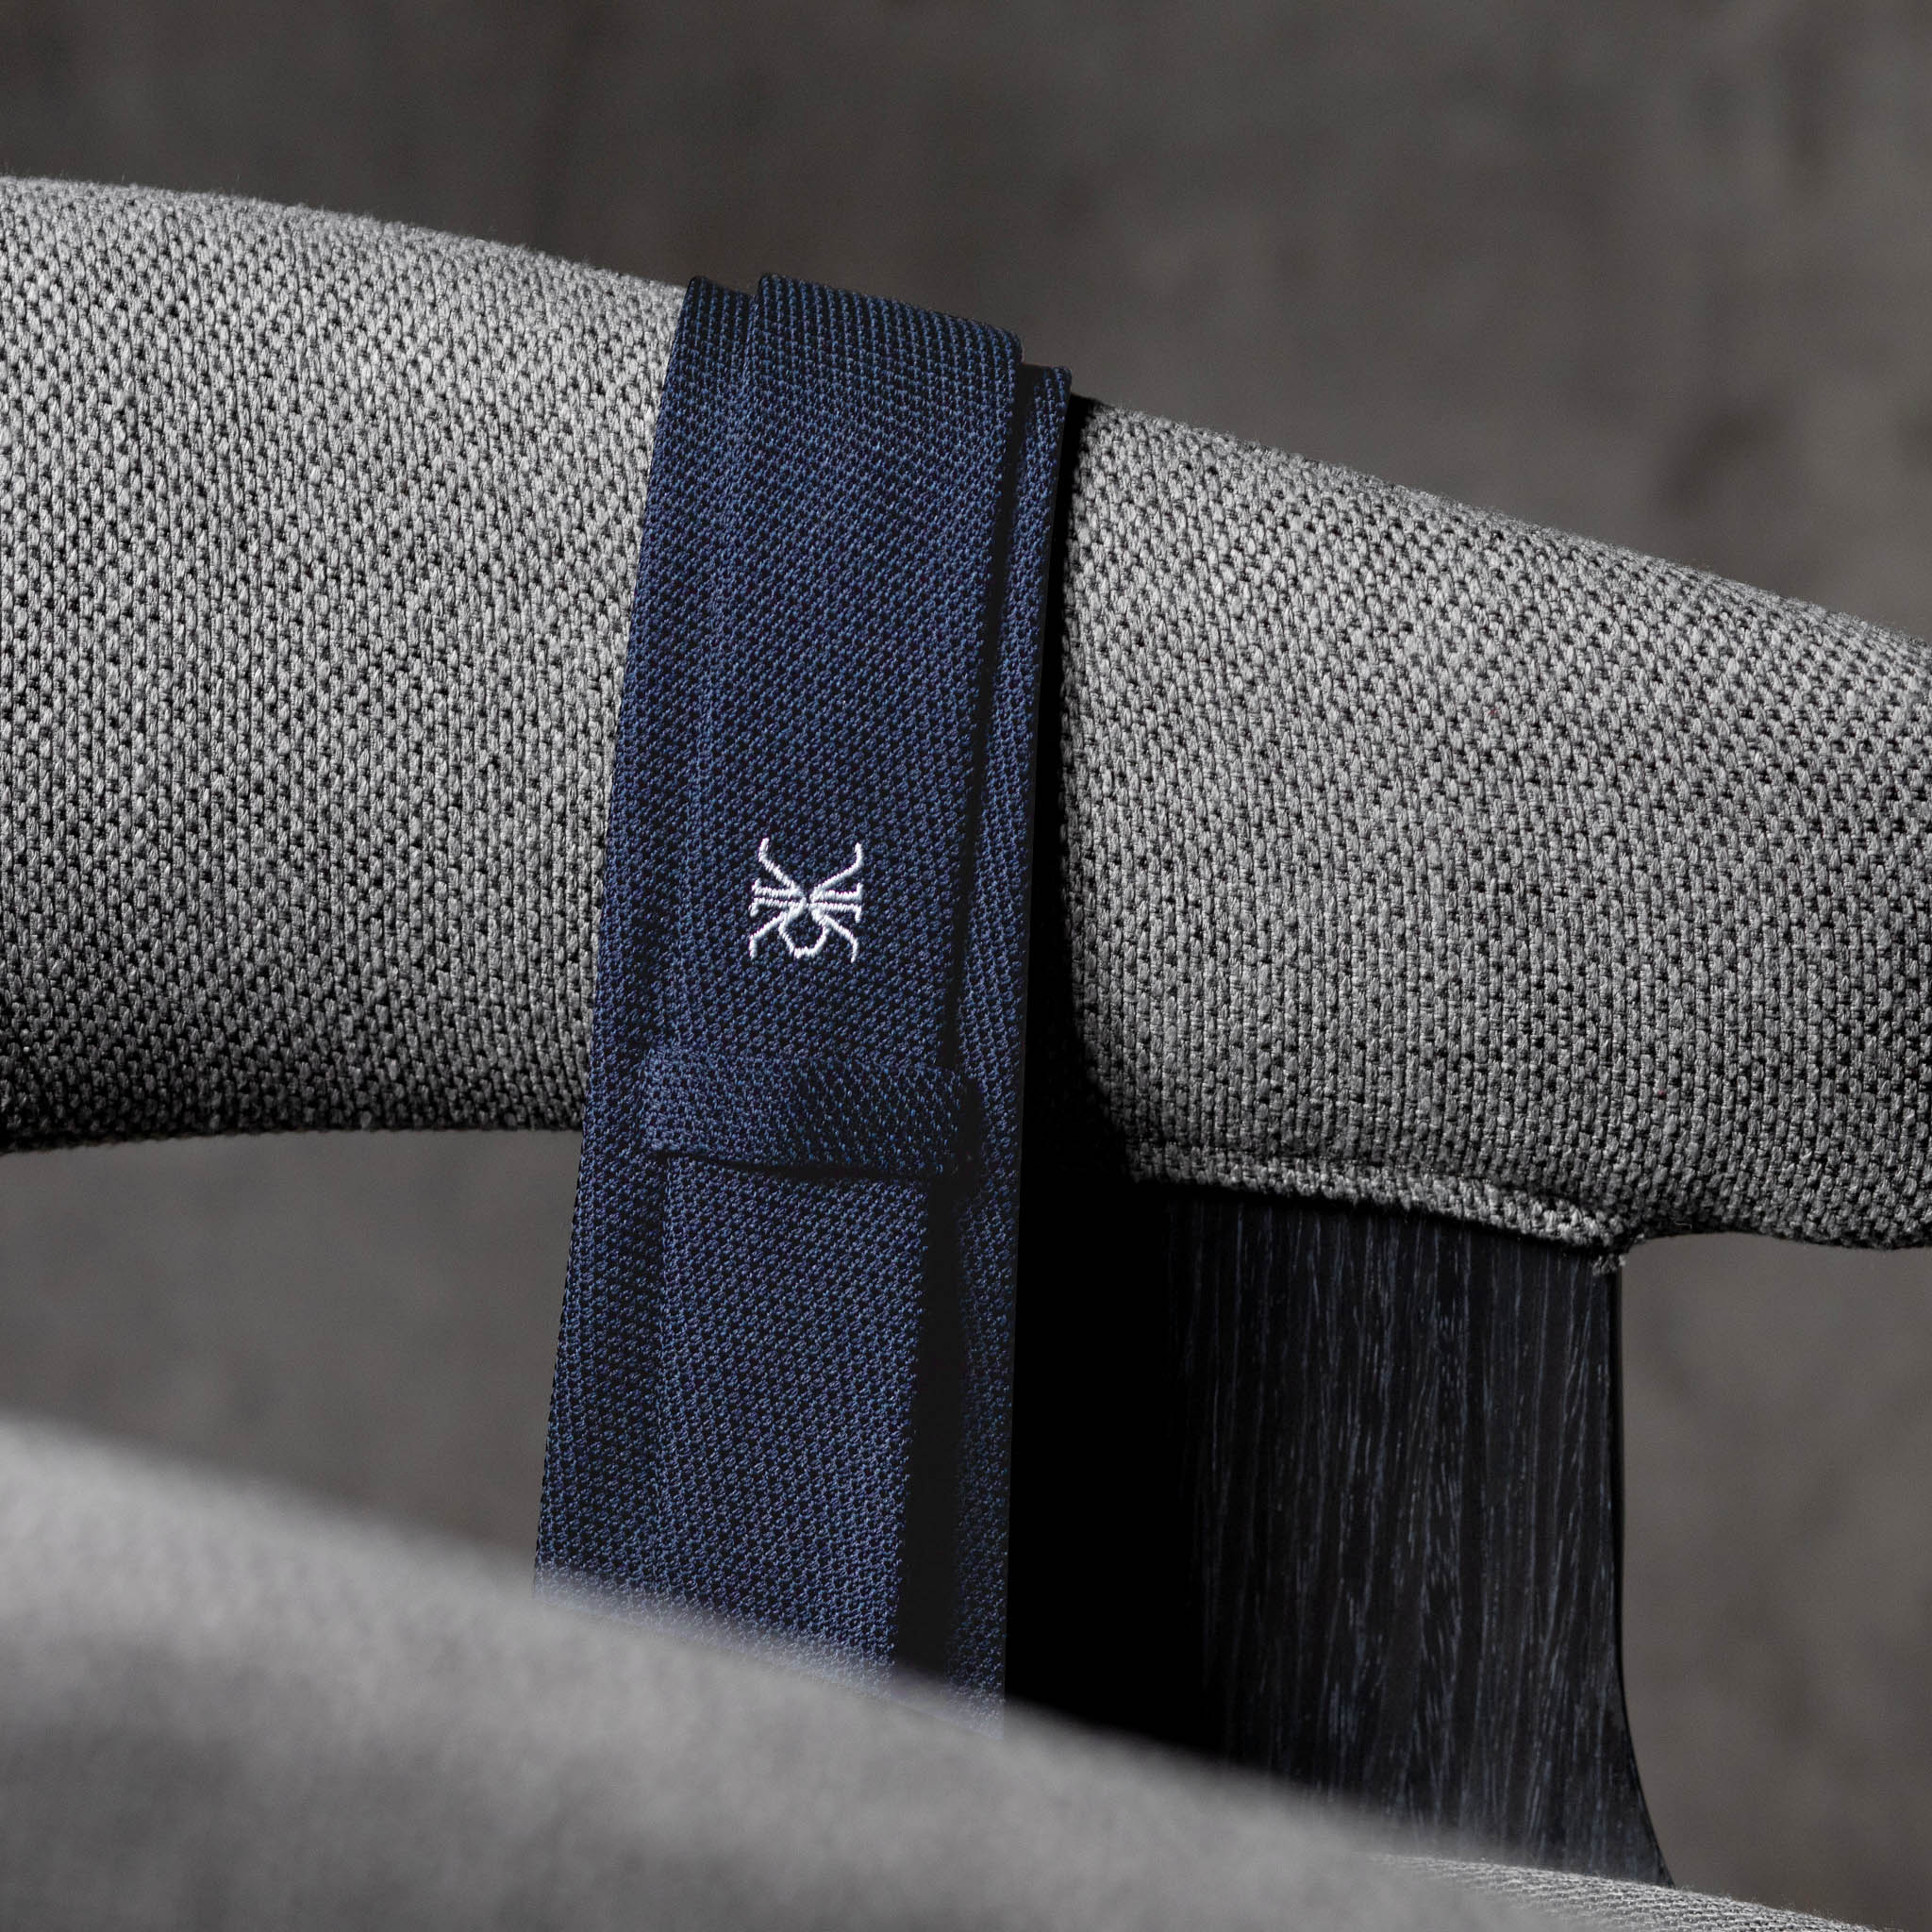 GRENADINE-0280-Tie-Initials-Corbata-Iniciales-The-Seelk-3